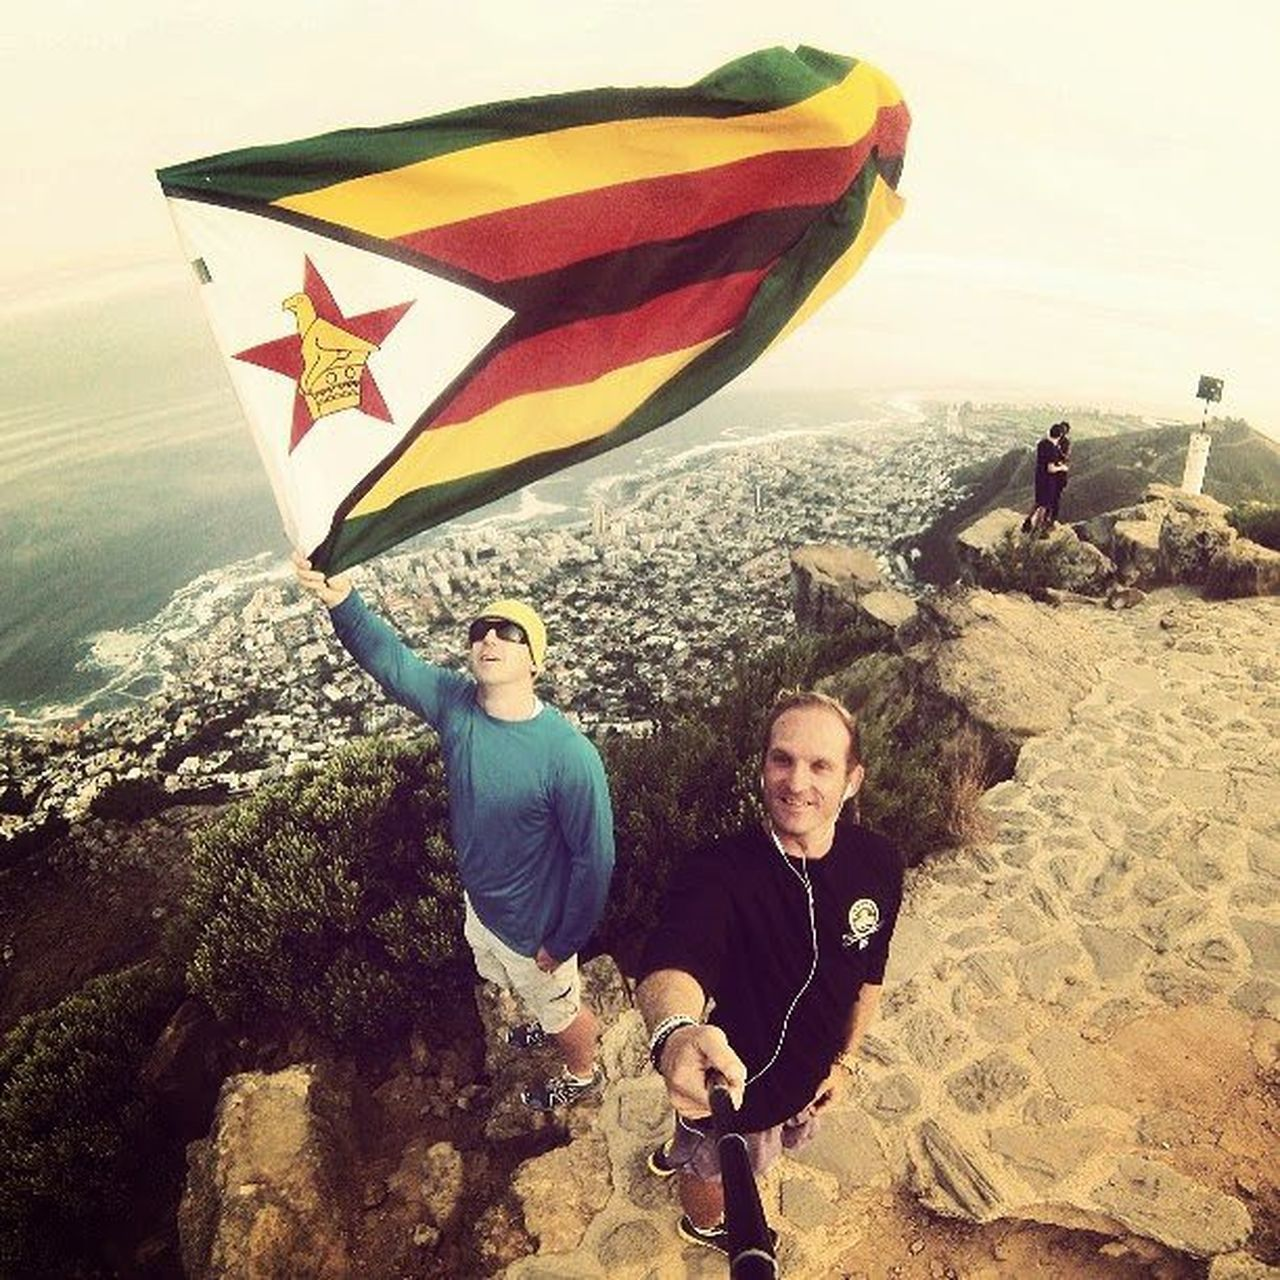 Be proud. Be a hero. HPSAbeahero HPSAbeahero Wohza Hero3 Adventure Flytheflag Proudlyzimbabwean Lionshead Capetown Southafrica